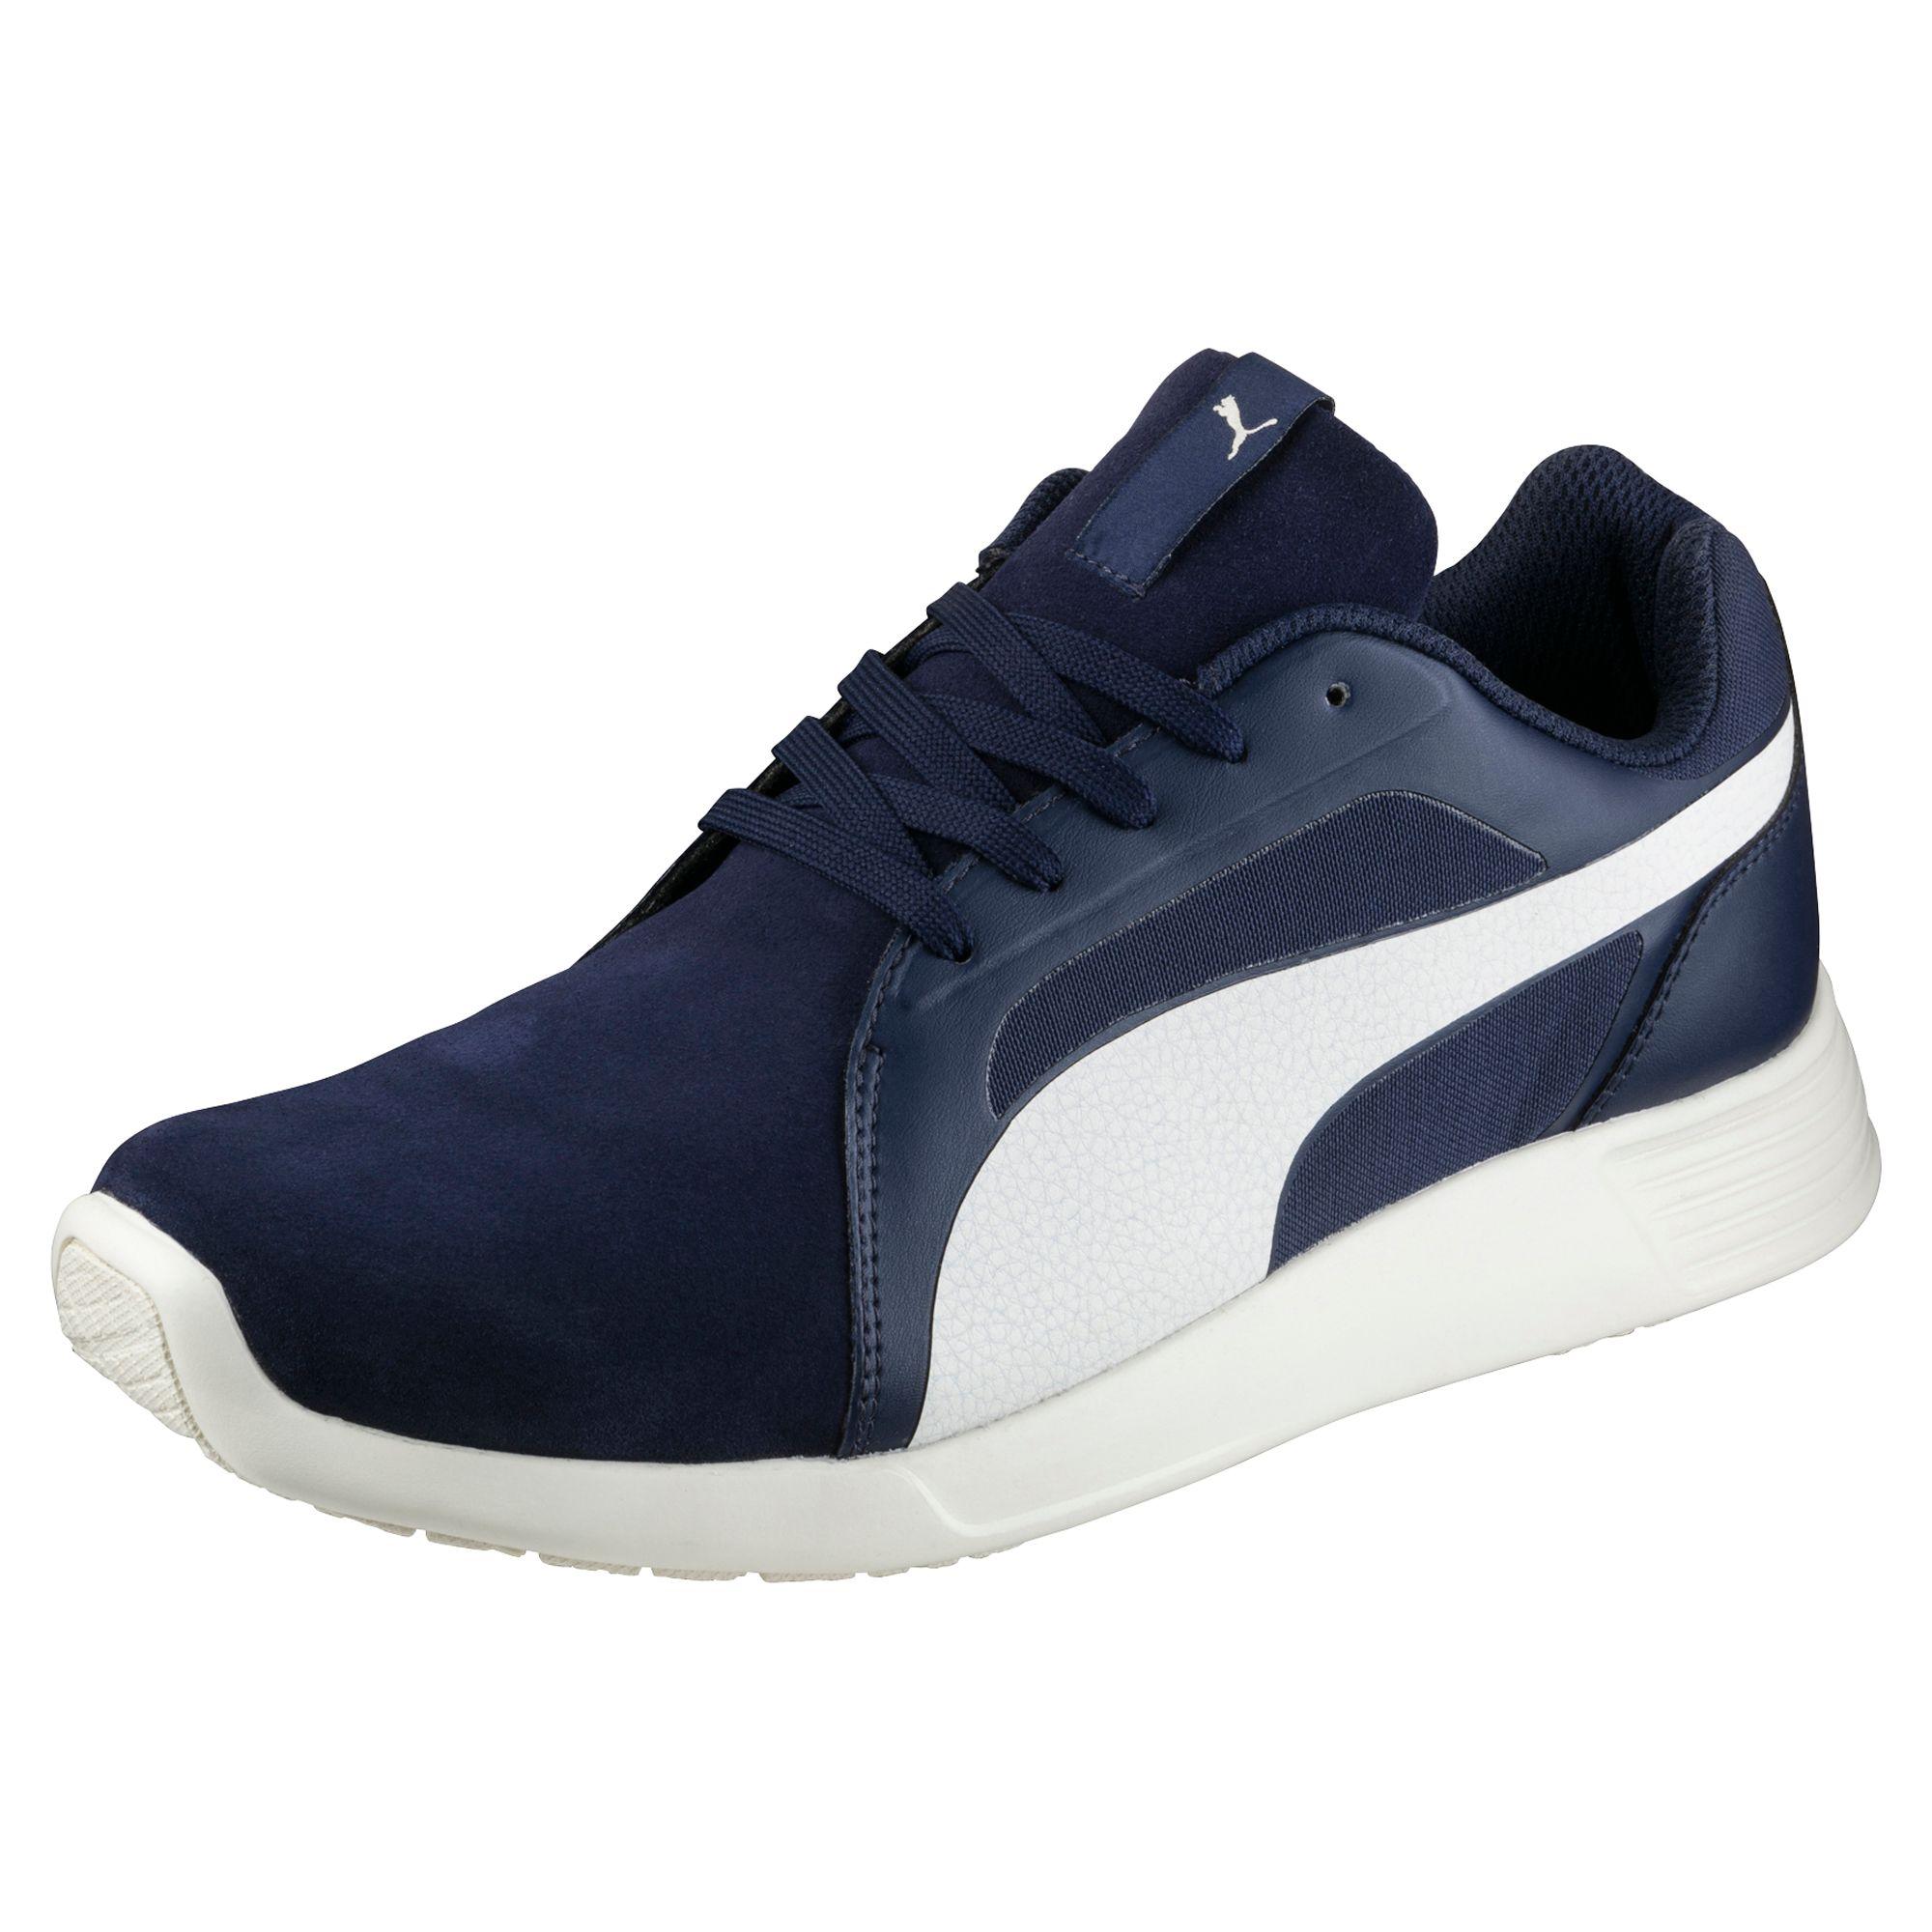 puma st trainer evo sd sneaker schuhe sneakers basics. Black Bedroom Furniture Sets. Home Design Ideas